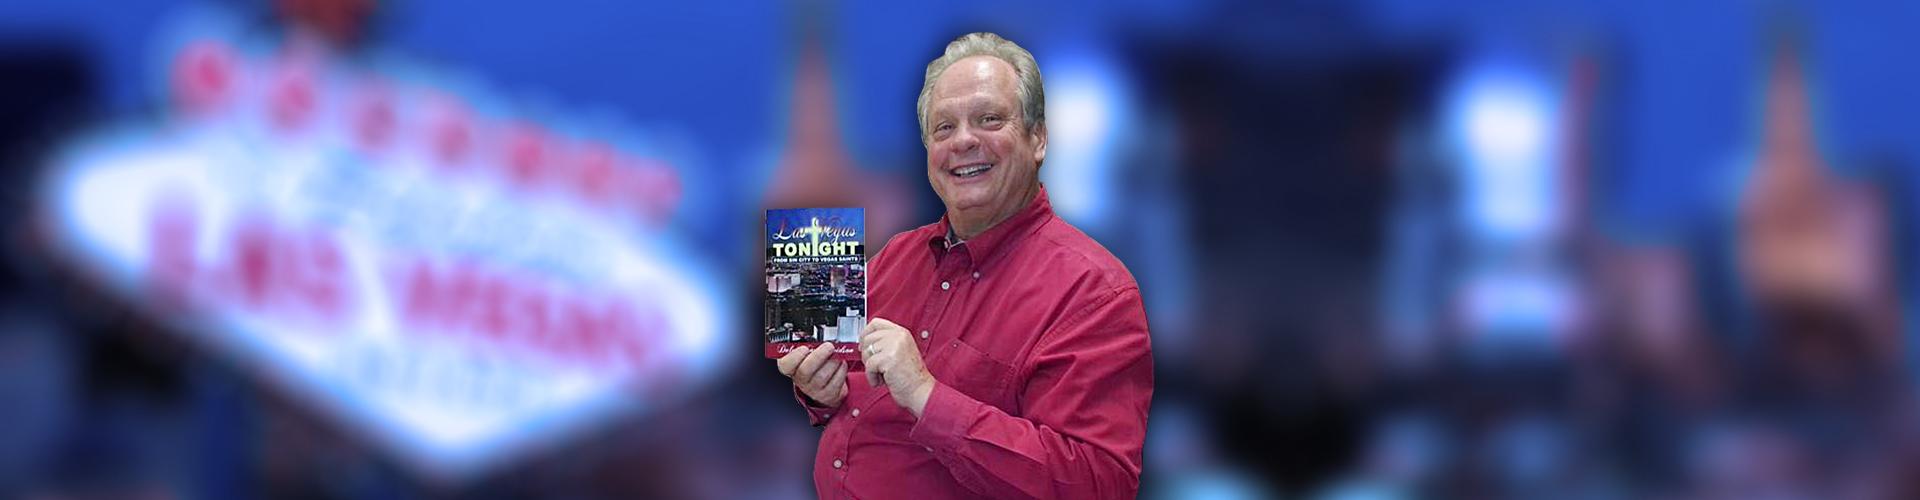 Dale Davidson holding book